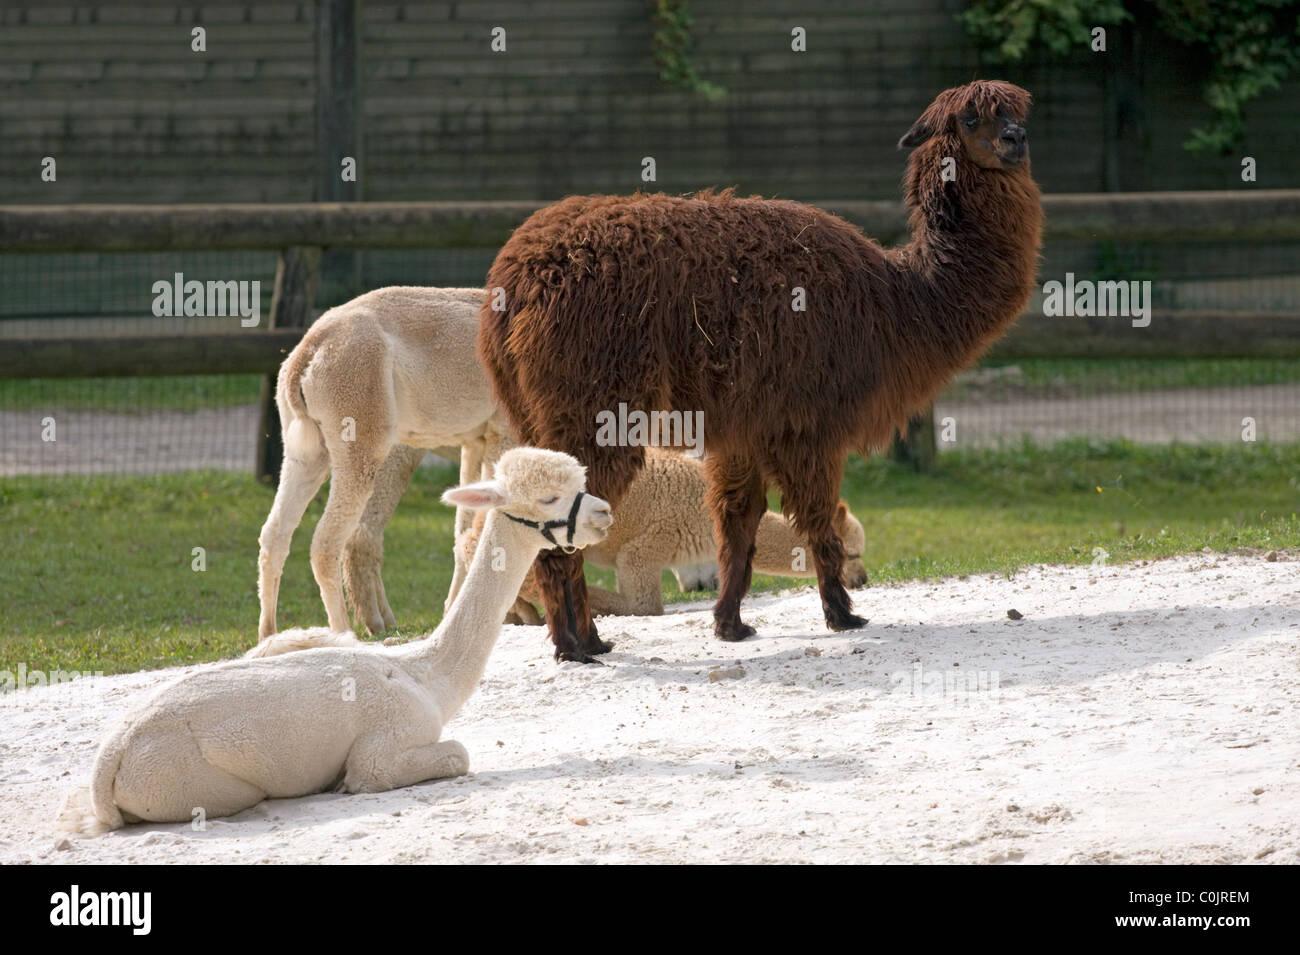 Alpaka (Lama Pacos) family with small baby animal. - Stock Image